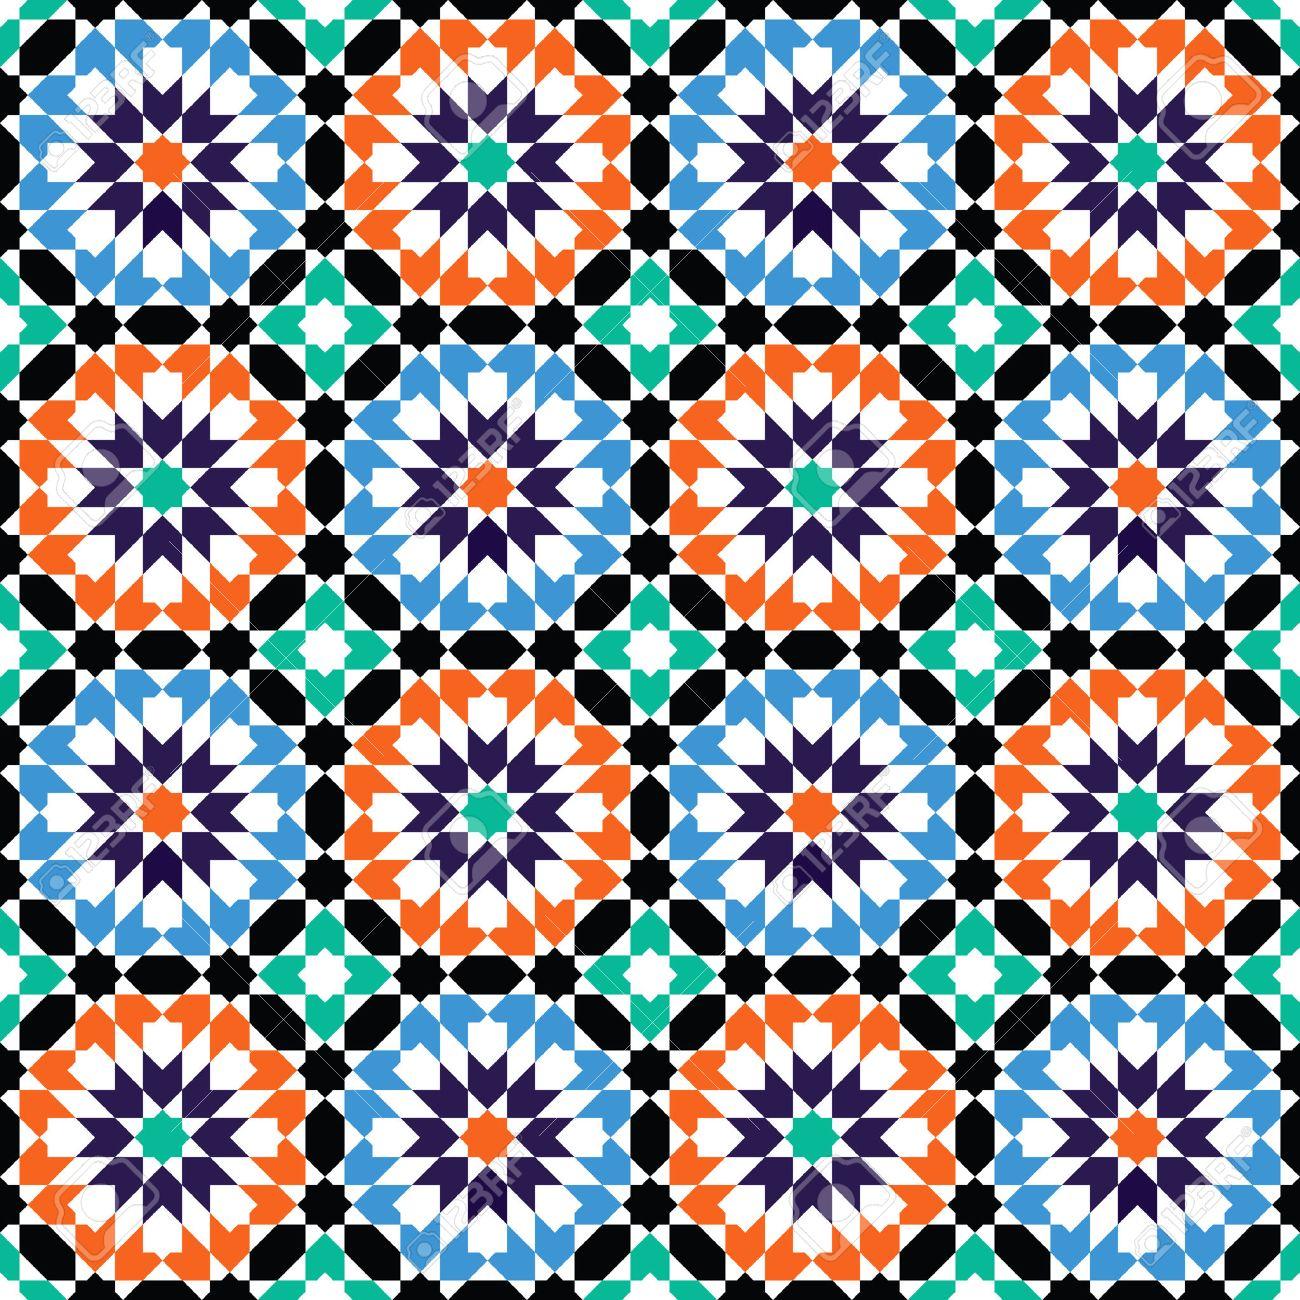 Moroccan style mosaic ornament. Seamless mosaic tile pattern - 37387105